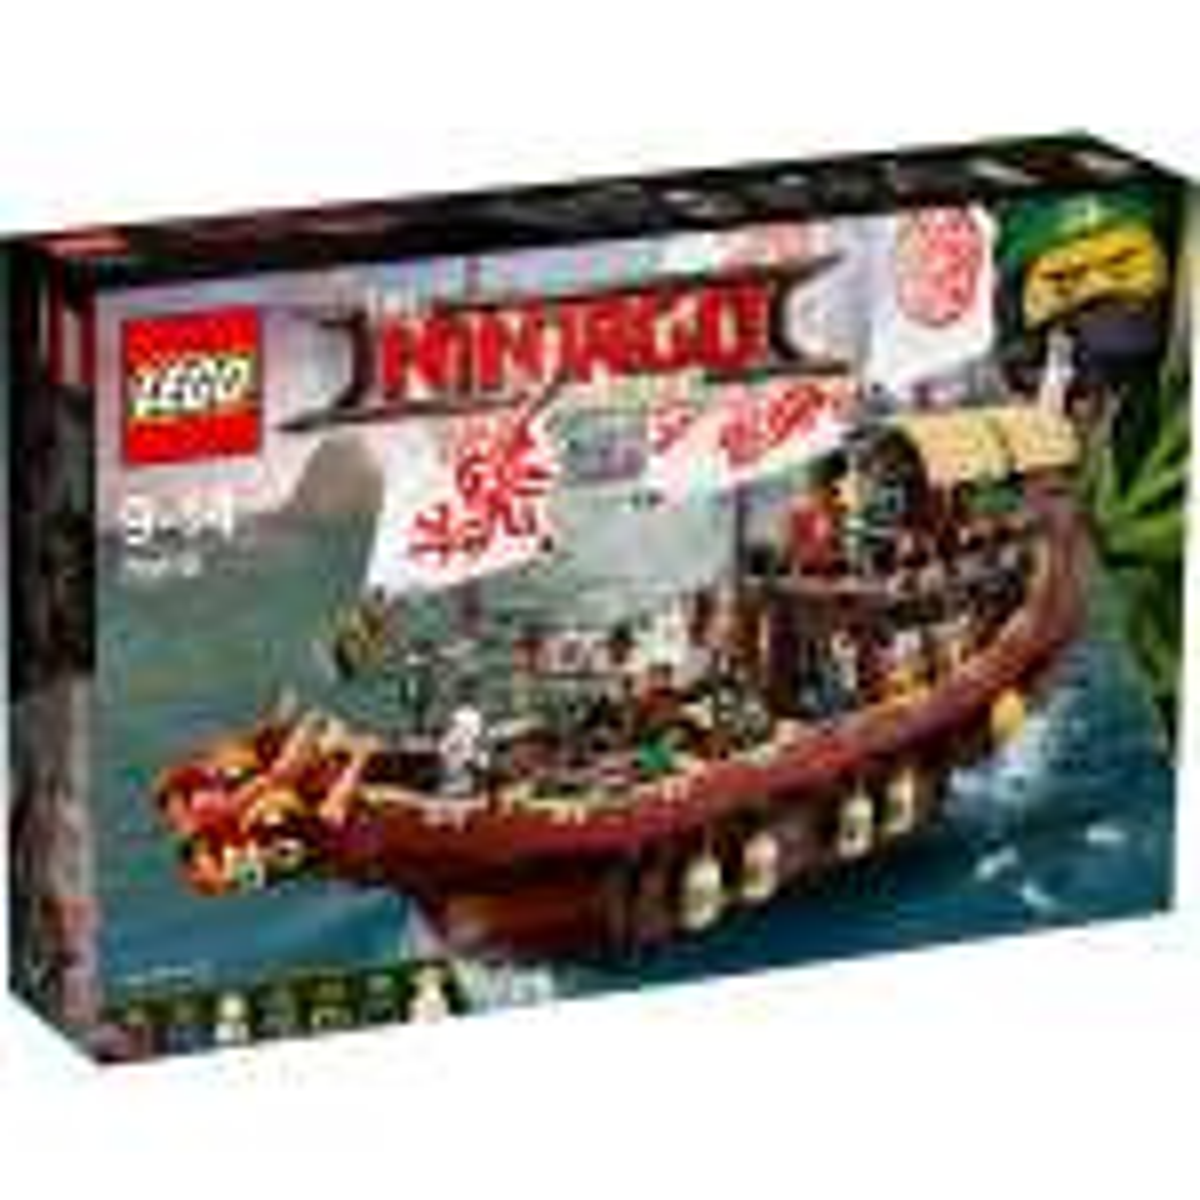 Karstadt - Lego 70618 Ninjago Movie Ninja-Flugsegler